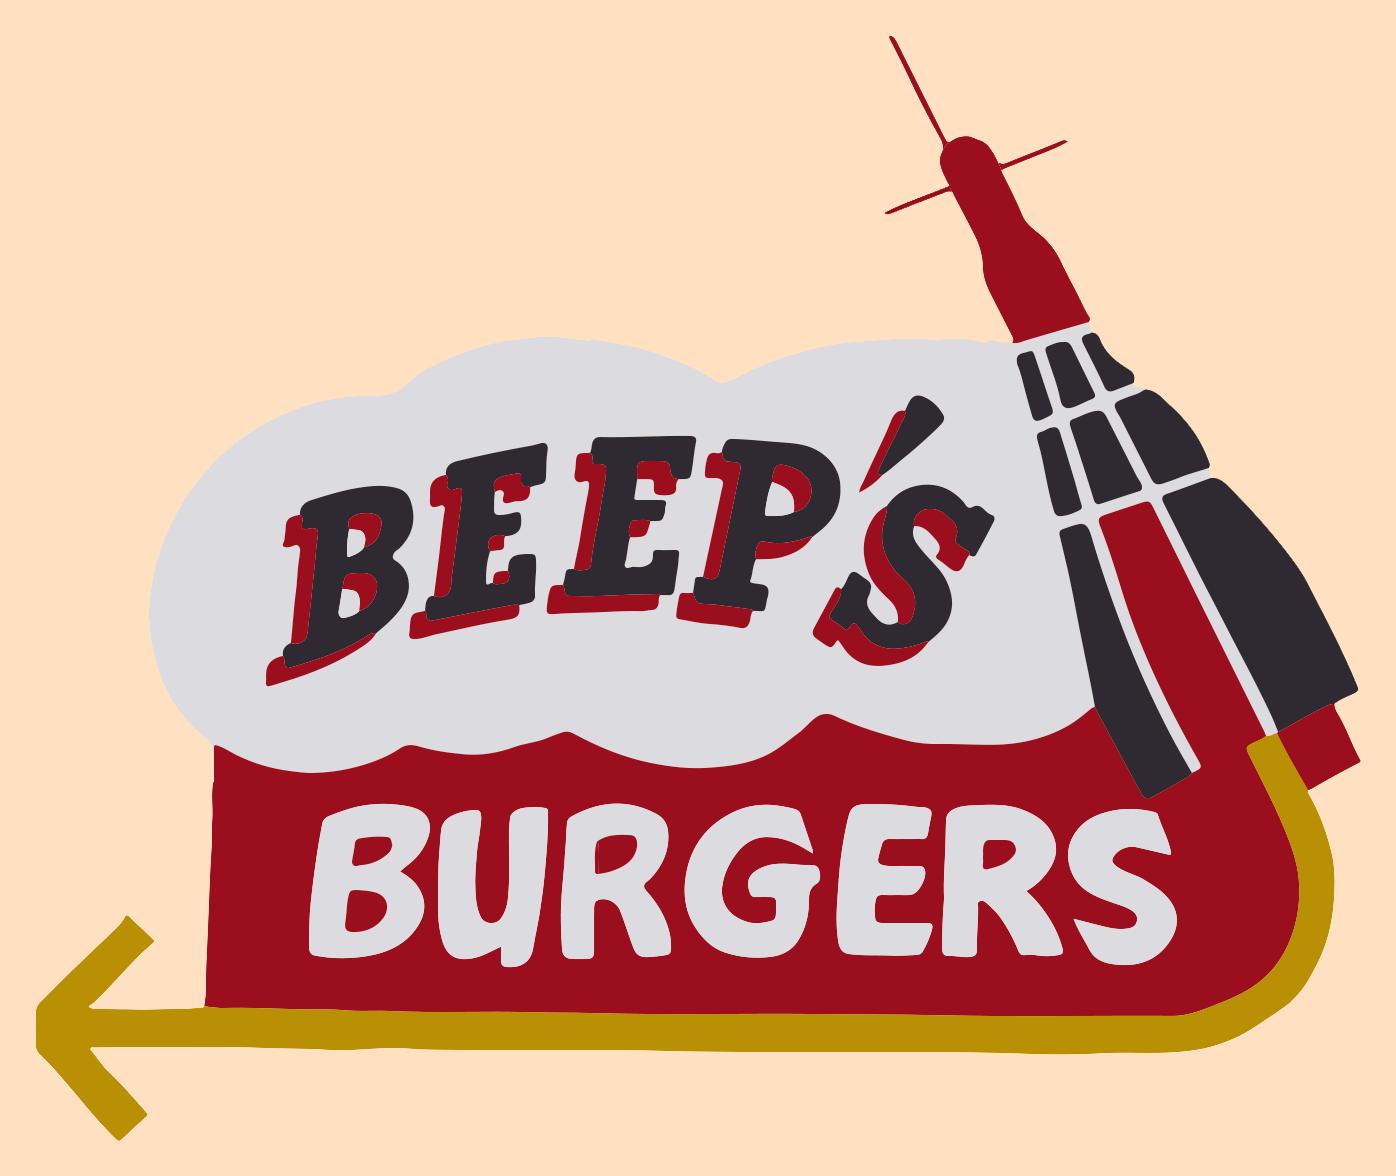 Beep s burgers . Burger clipart beef burger